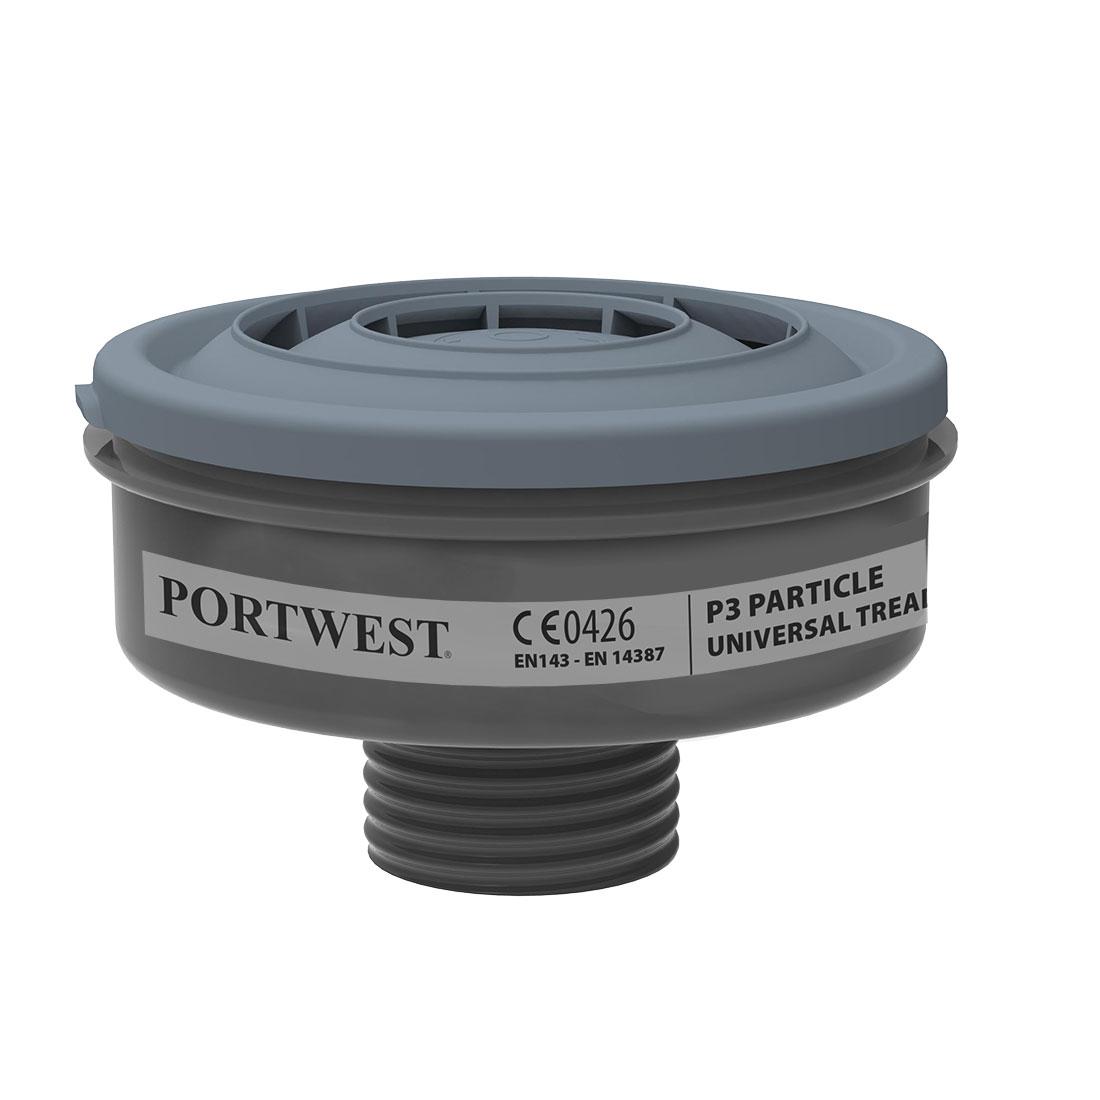 Portwest P3 Particle Filter Universal Tread - P946